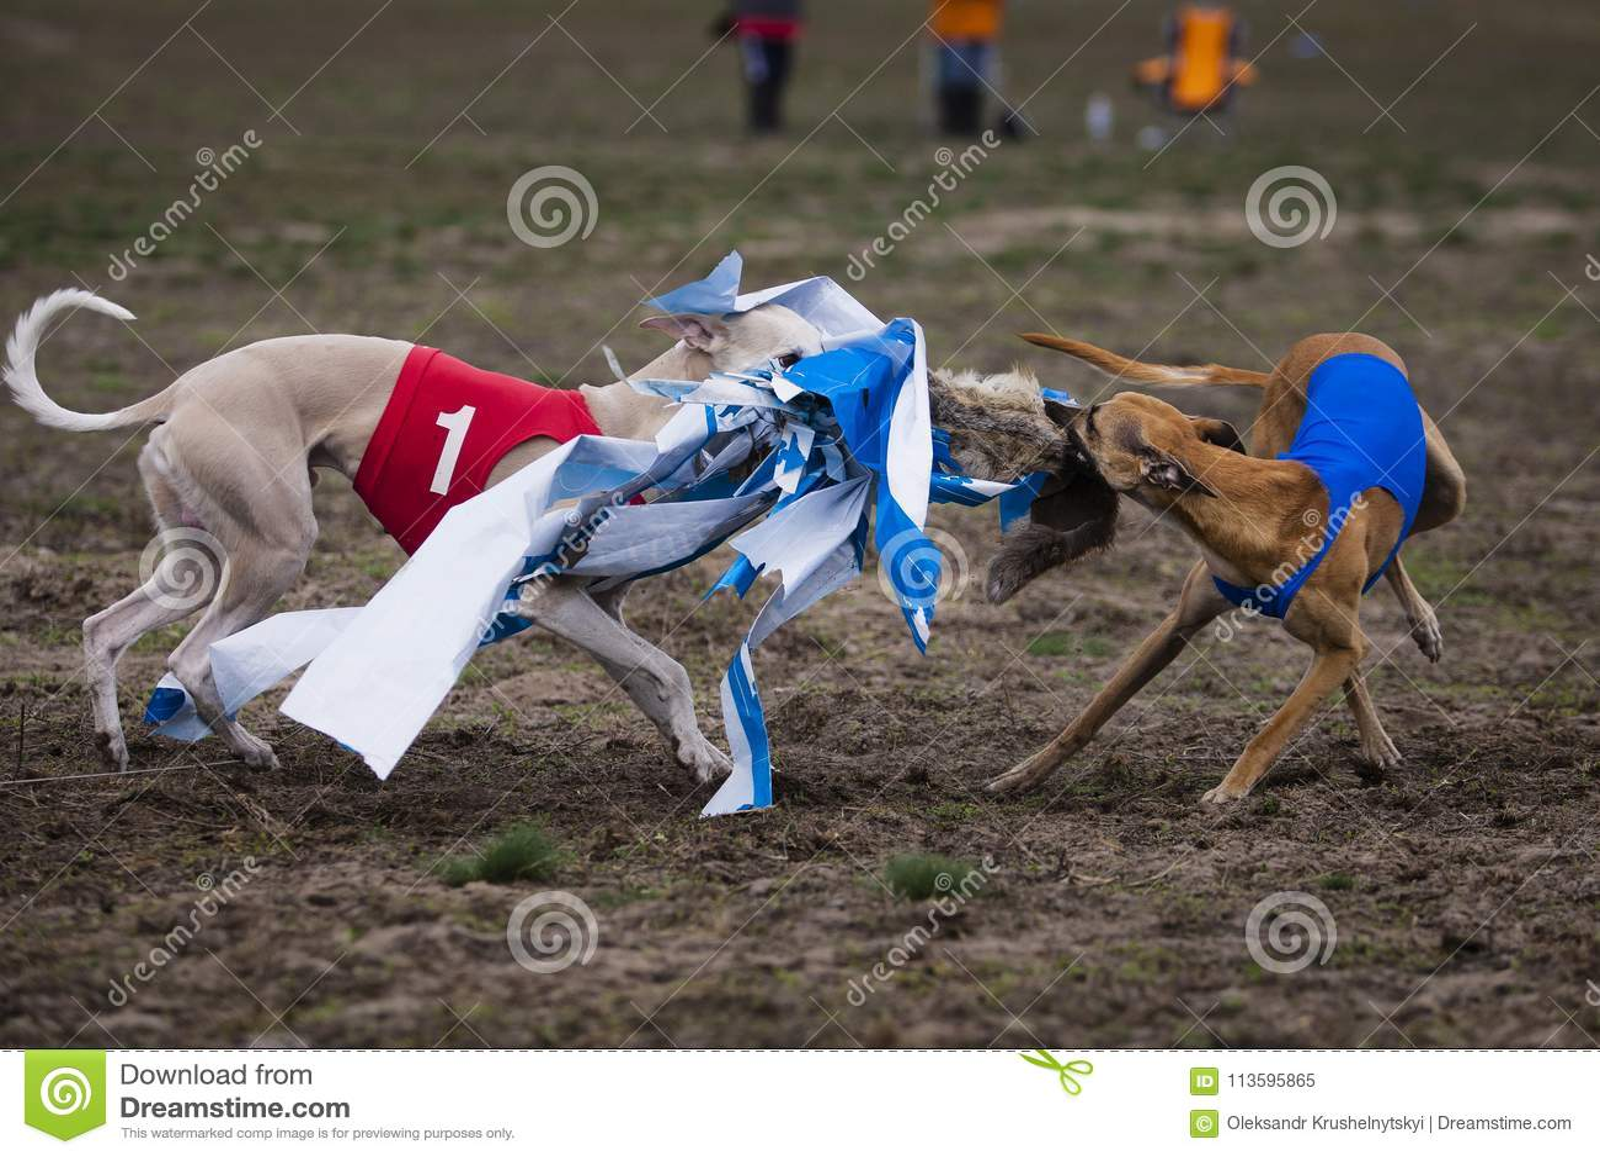 Whippethundspring i fältet